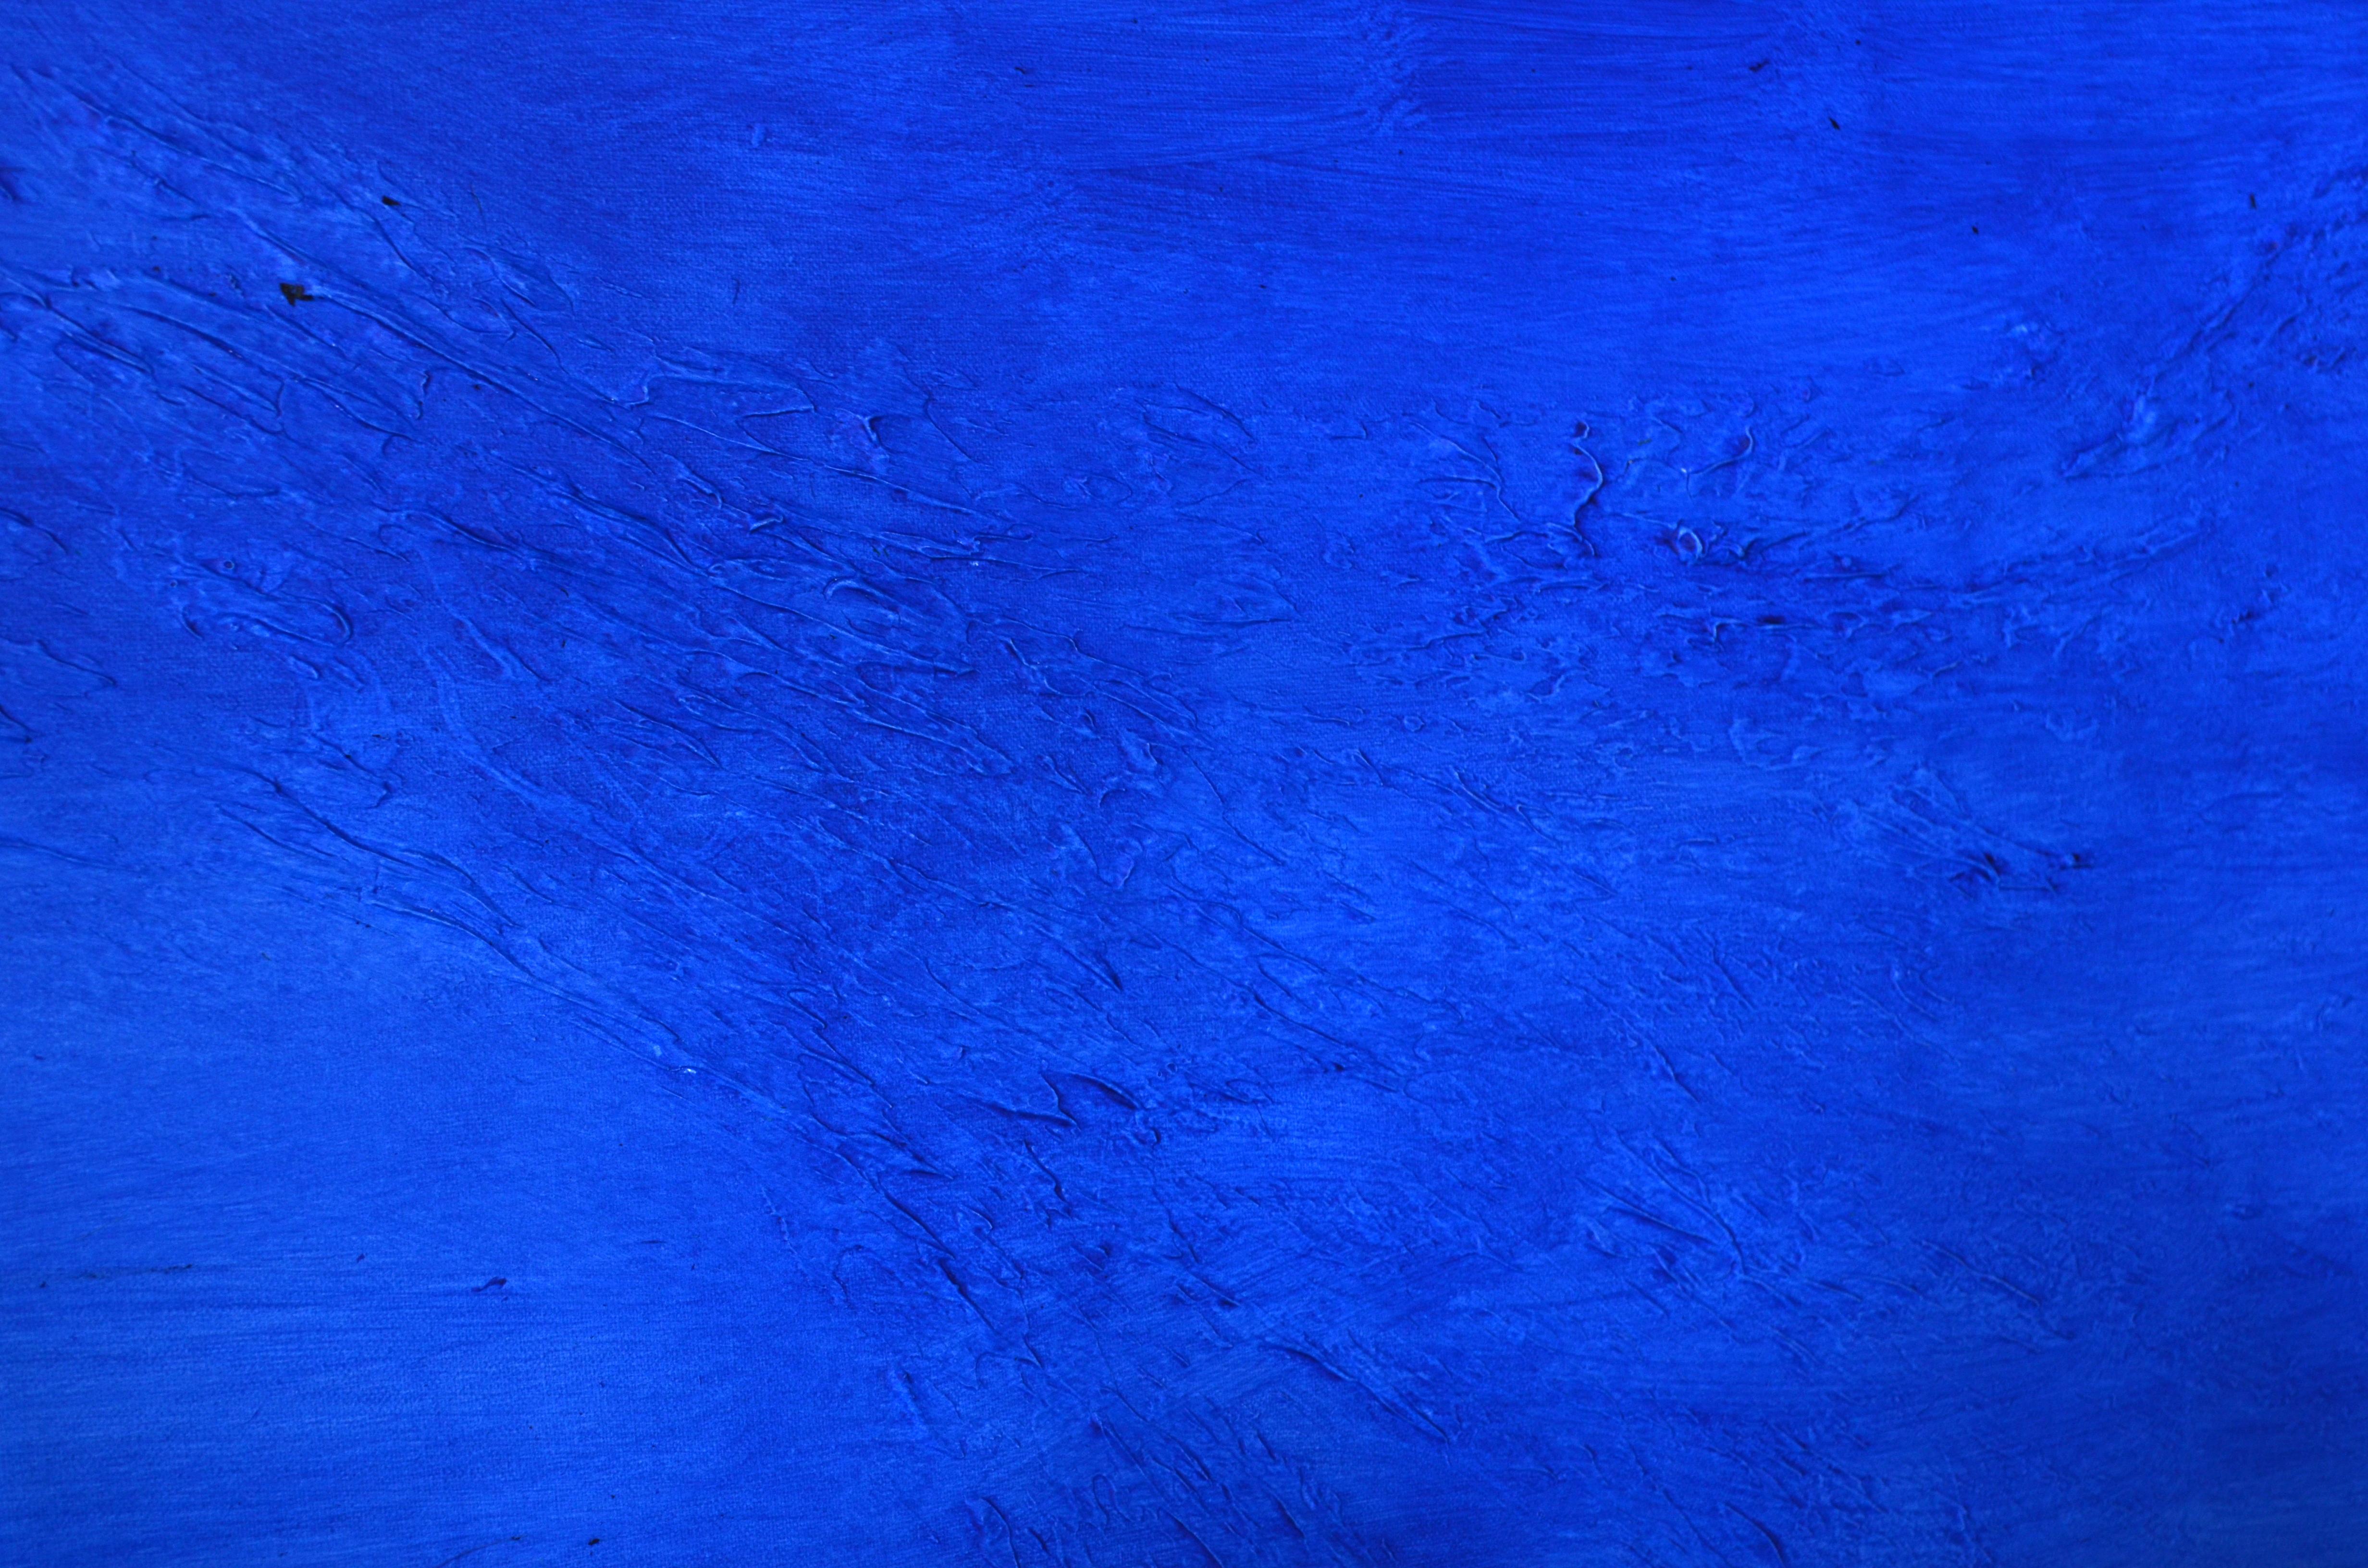 Nomen Est Omen painting by Jimmy Peggie